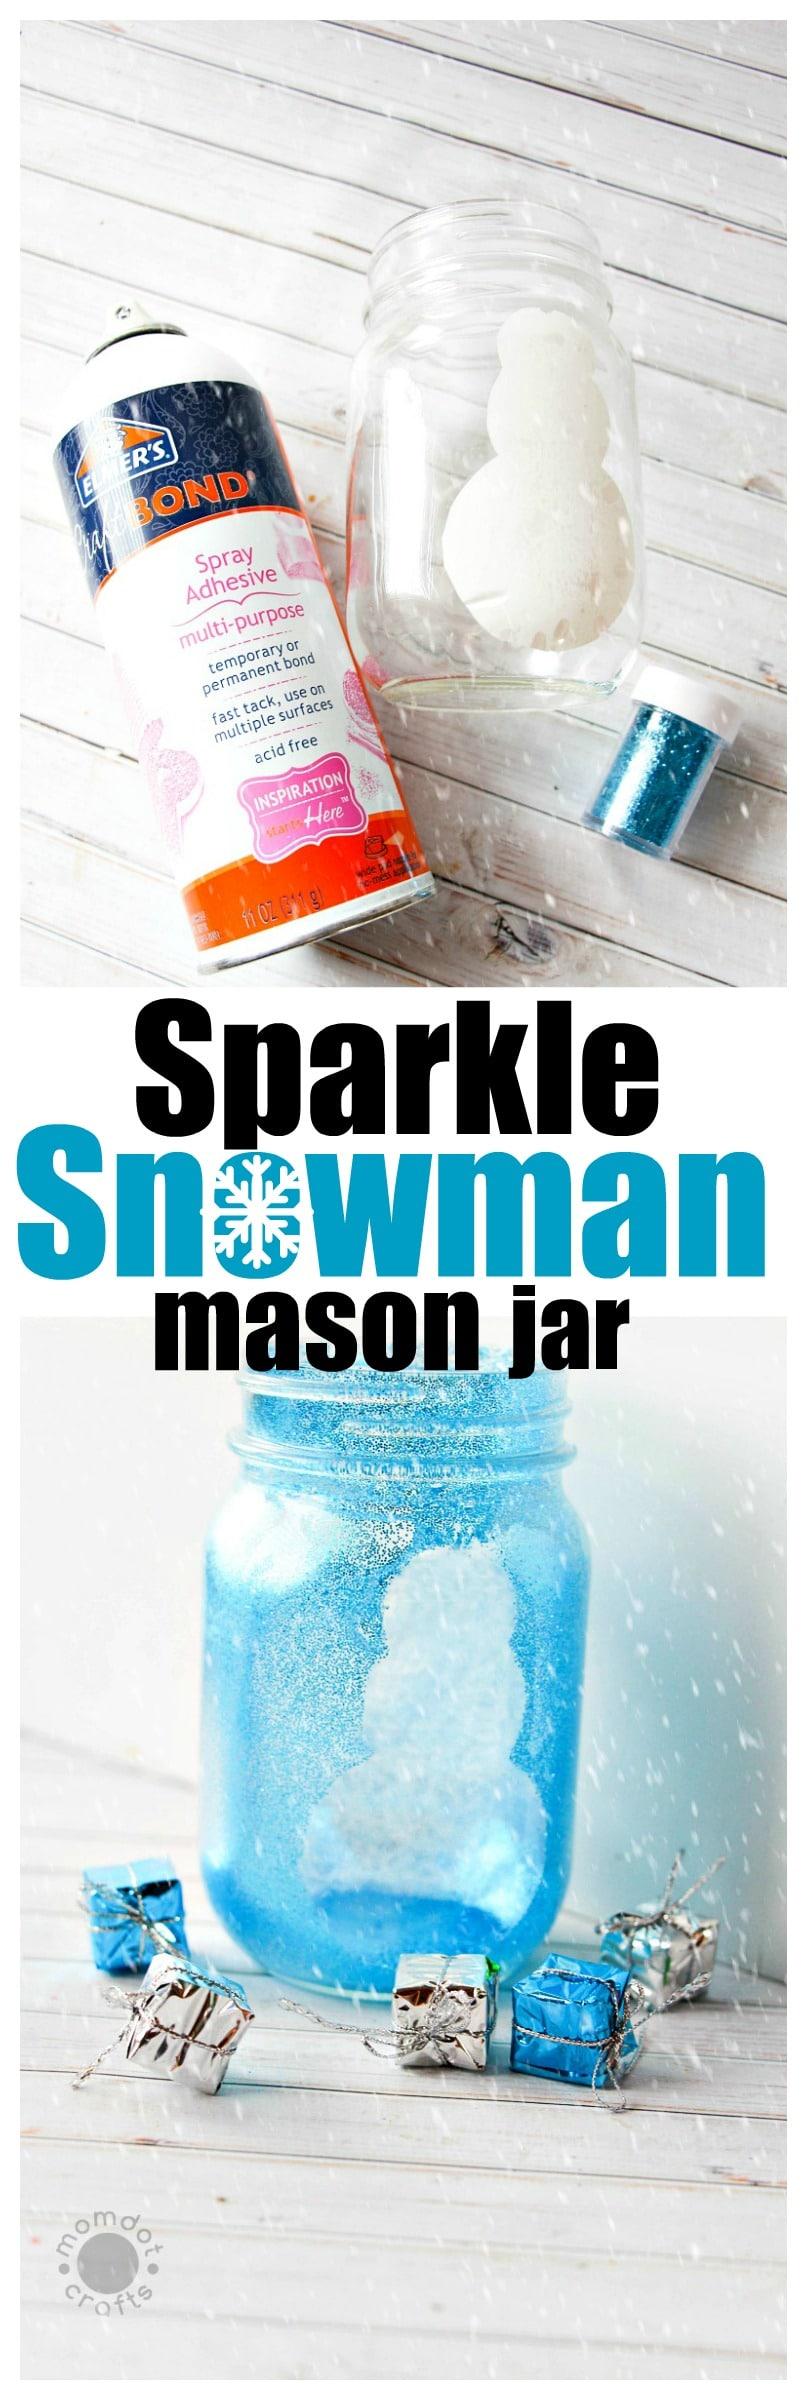 snowman mason jar crafts - sparkly like snow, create a mason jar centerpiece that is totally cute! Easy DIY instructions